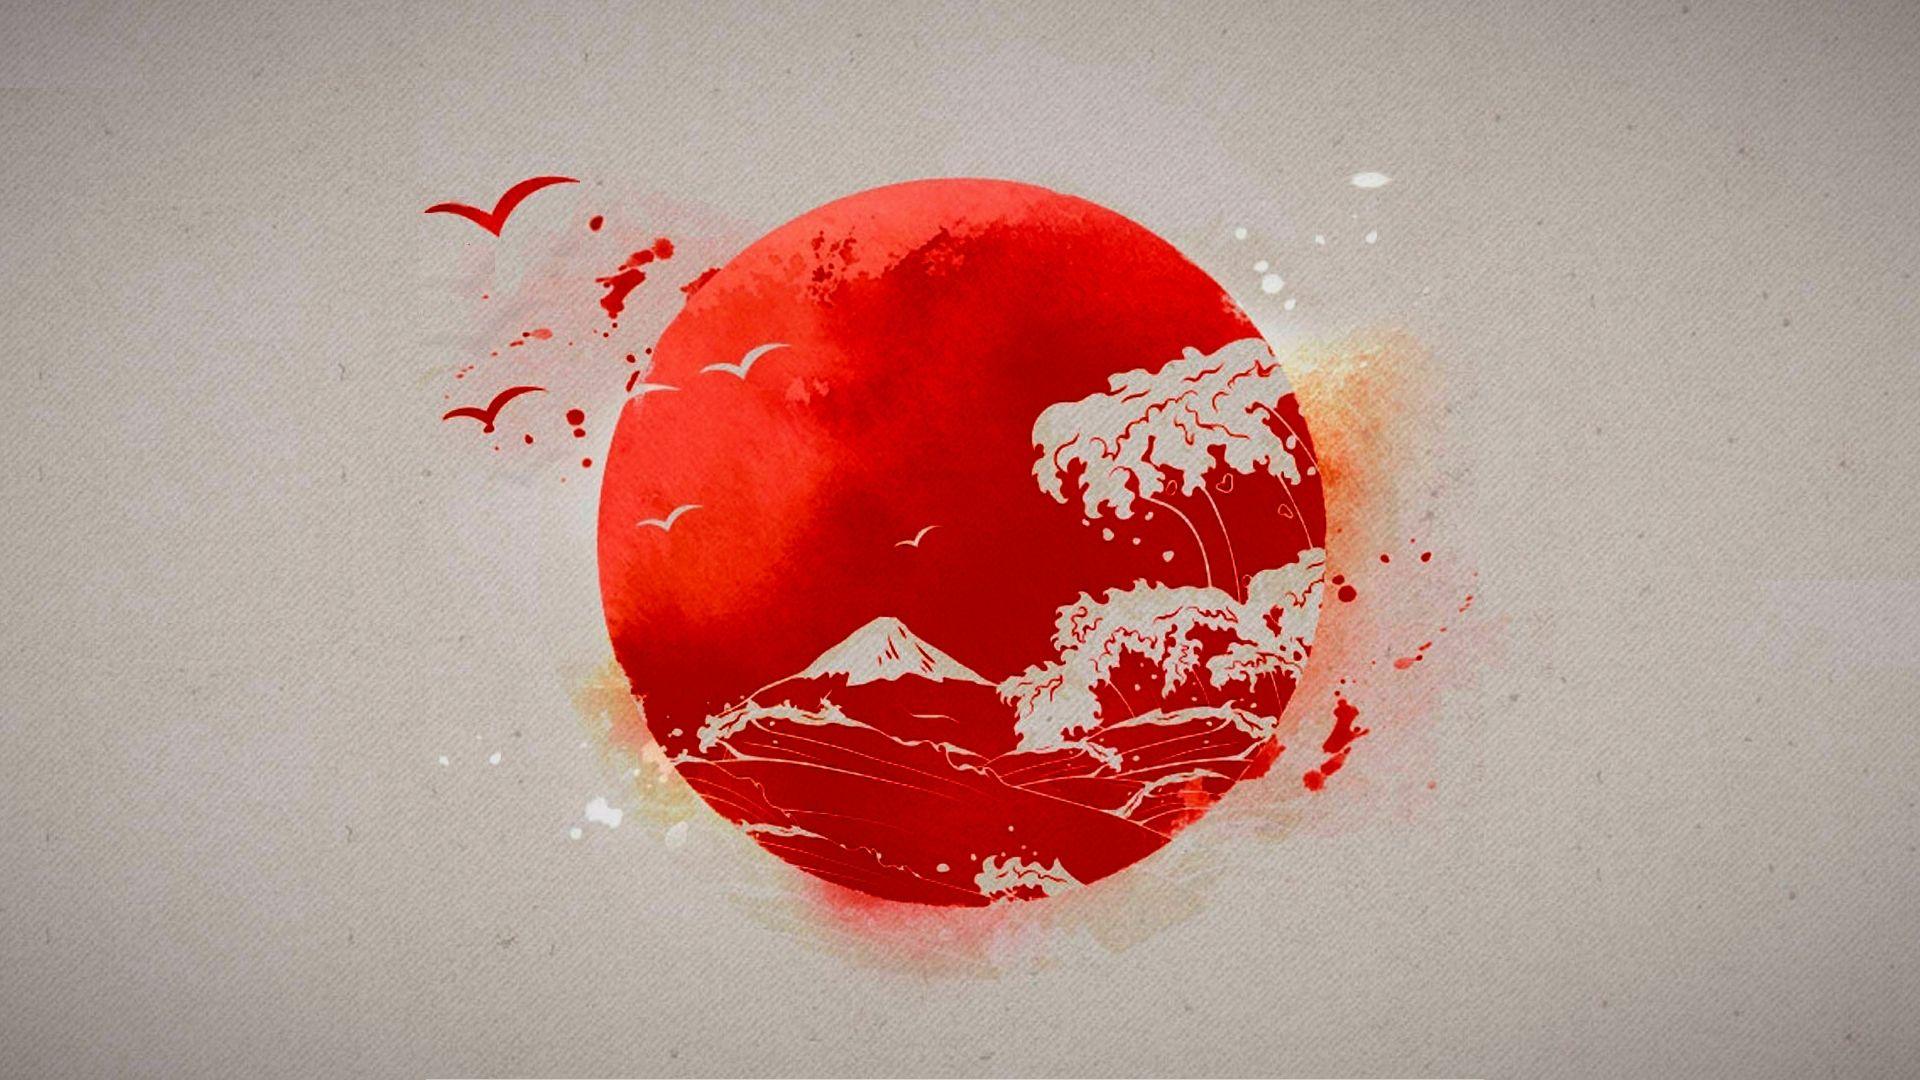 japan flags wallpaper 1920x1080 - photo #1